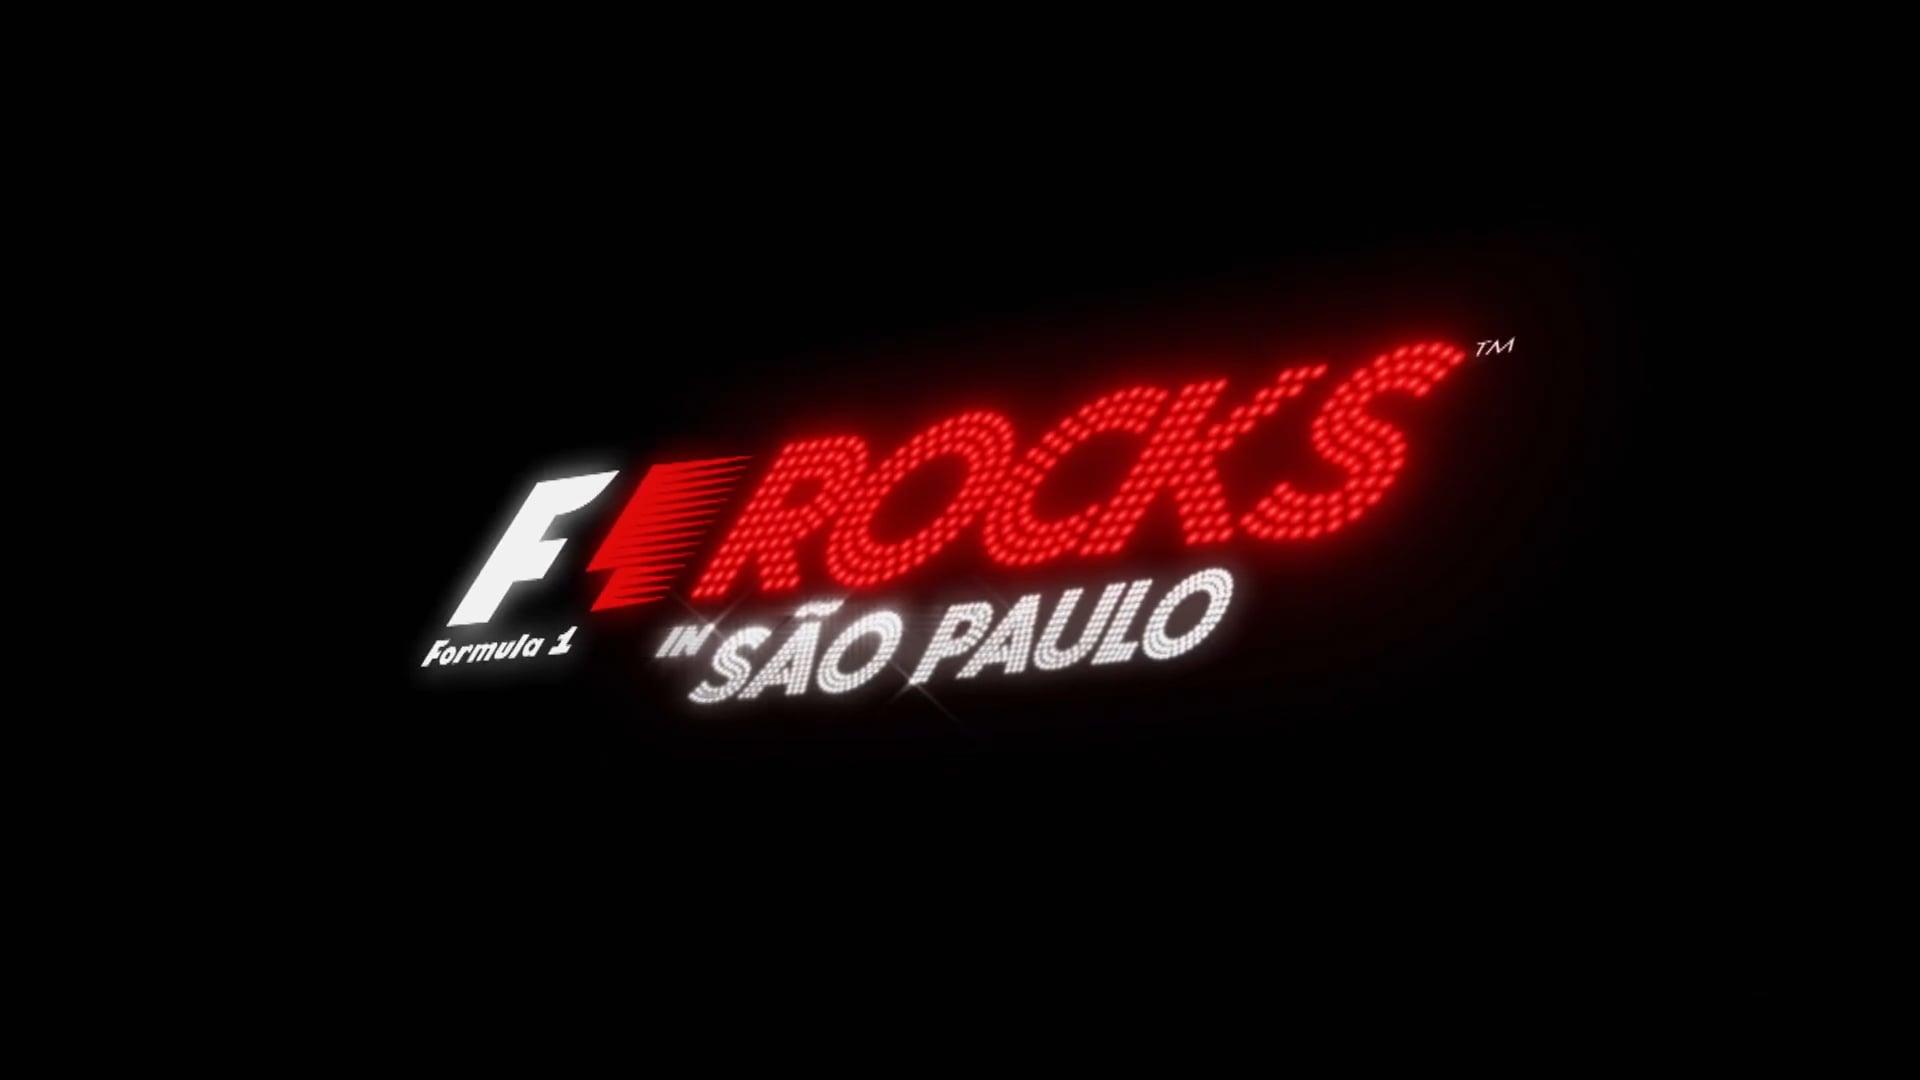 F1Rocks Sao Paulo Excerpt